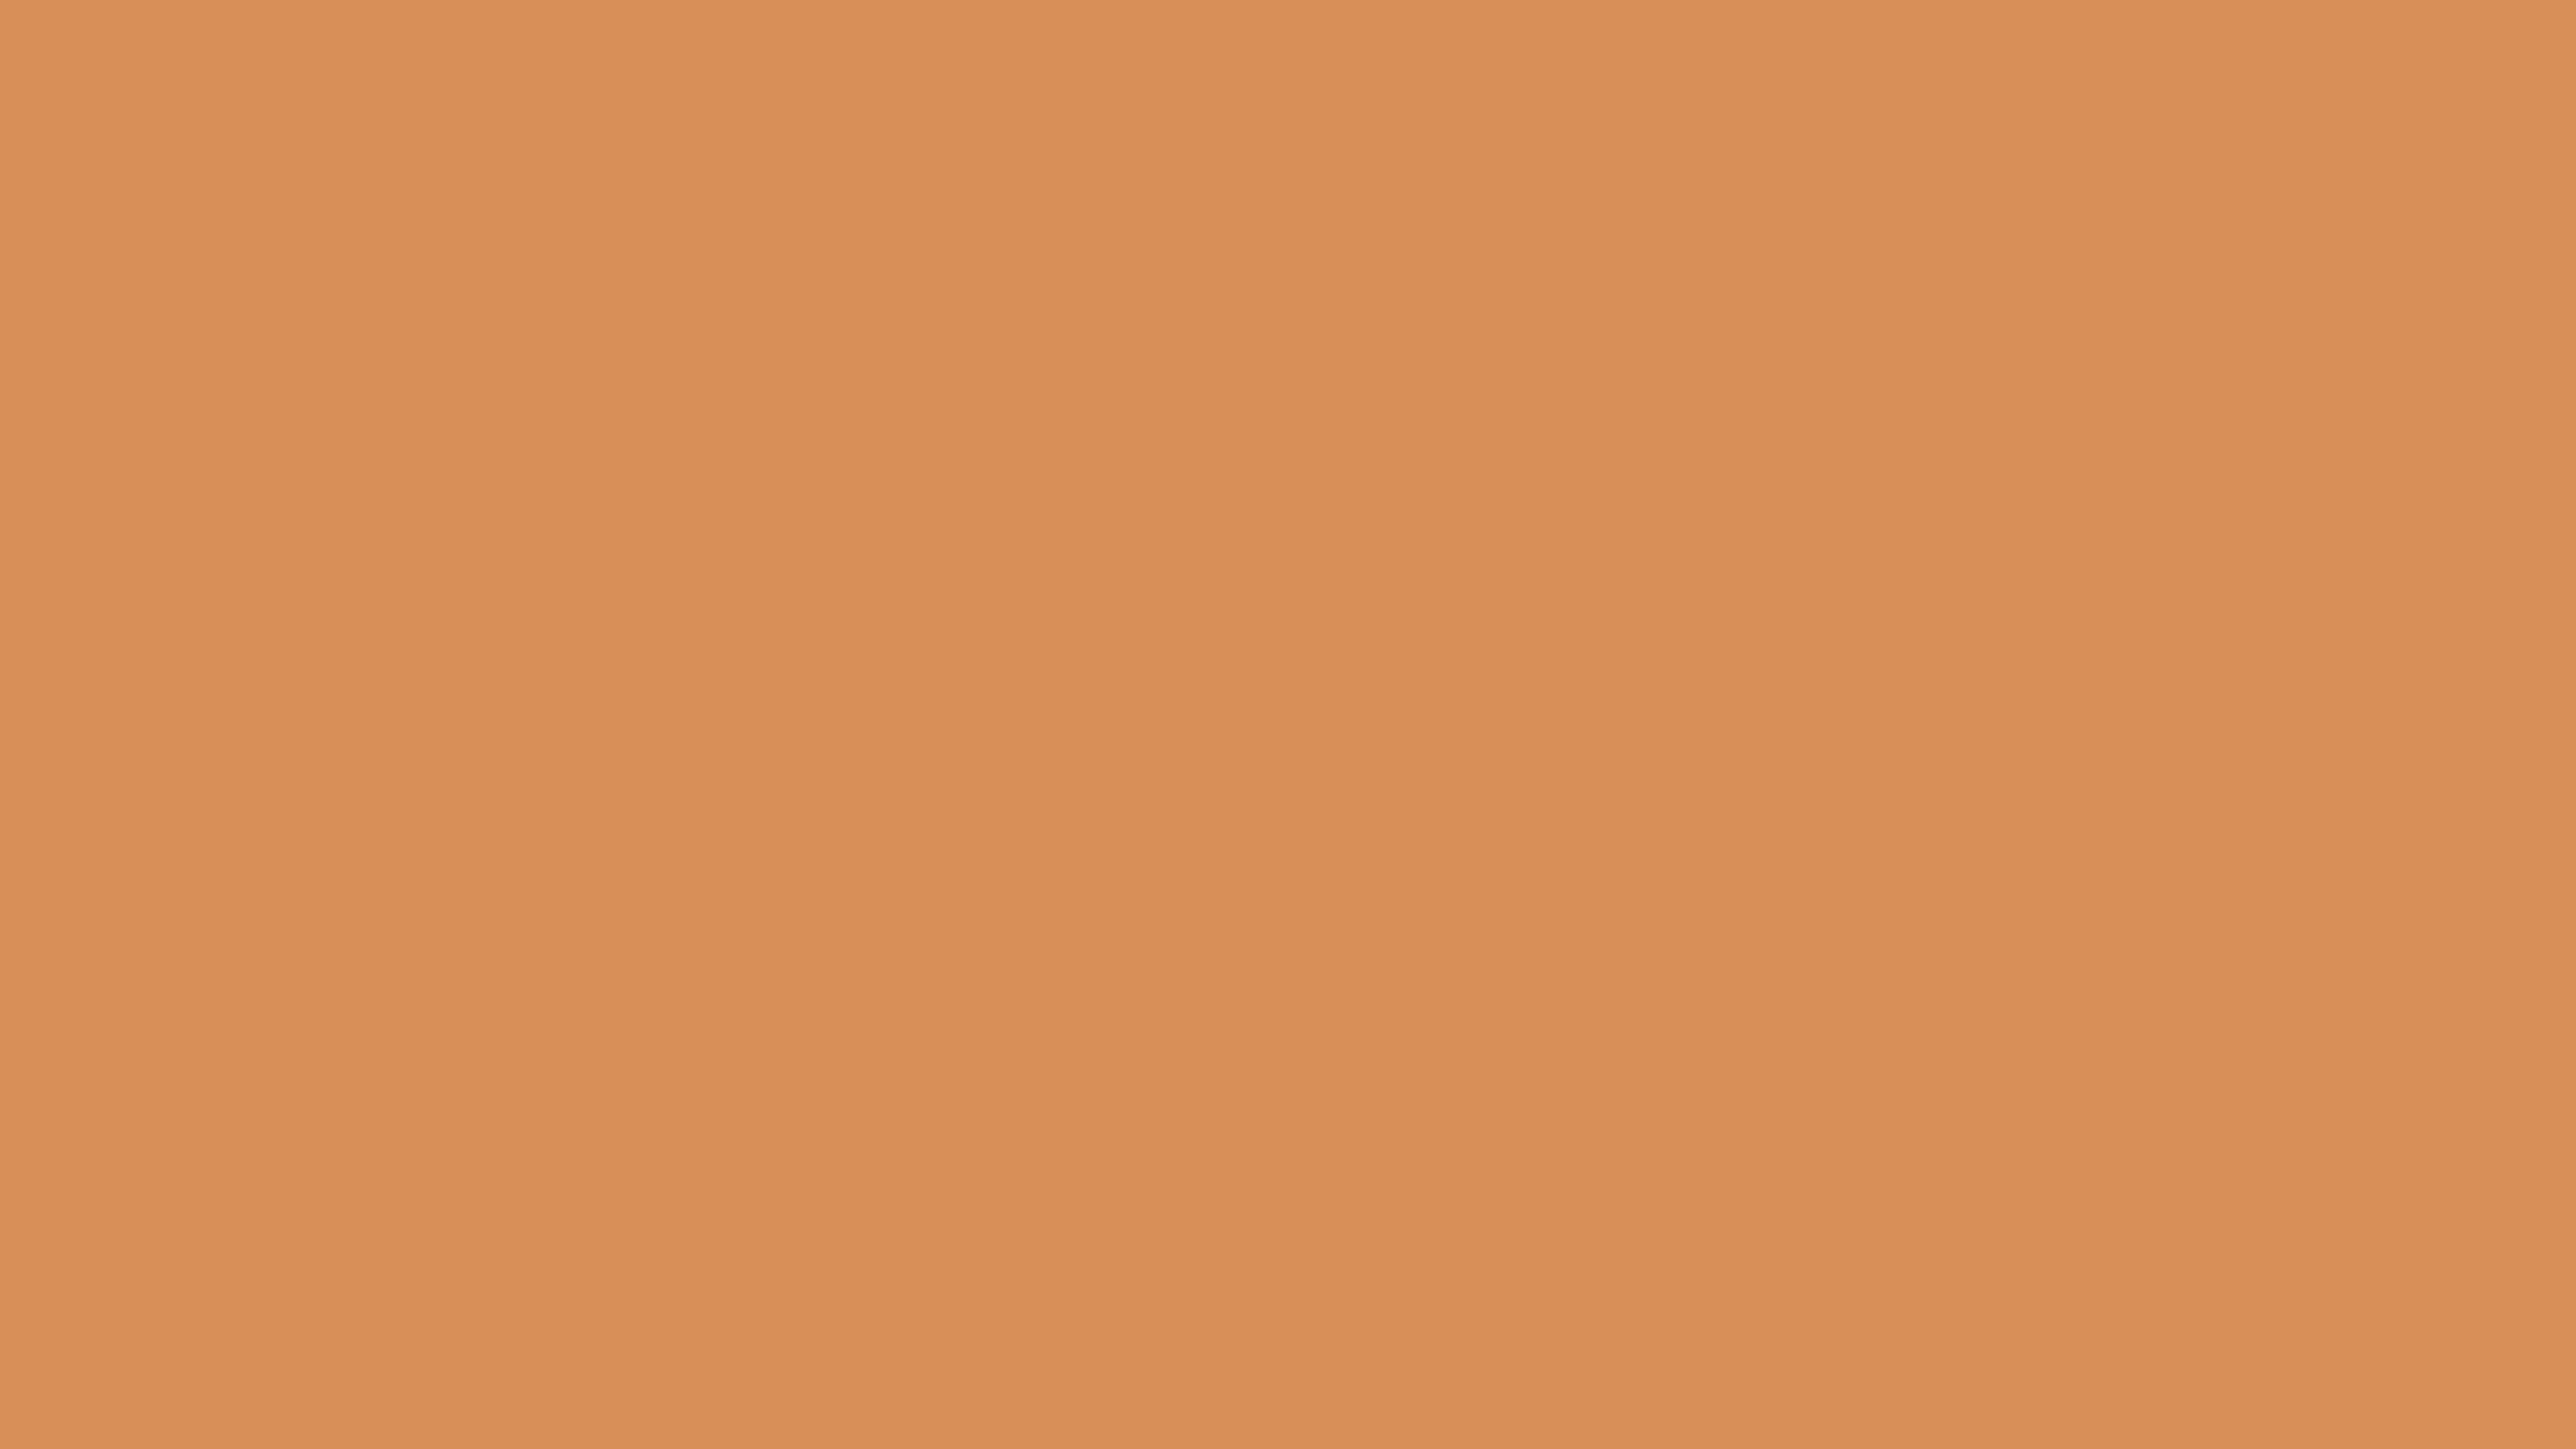 4096x2304 Persian Orange Solid Color Background